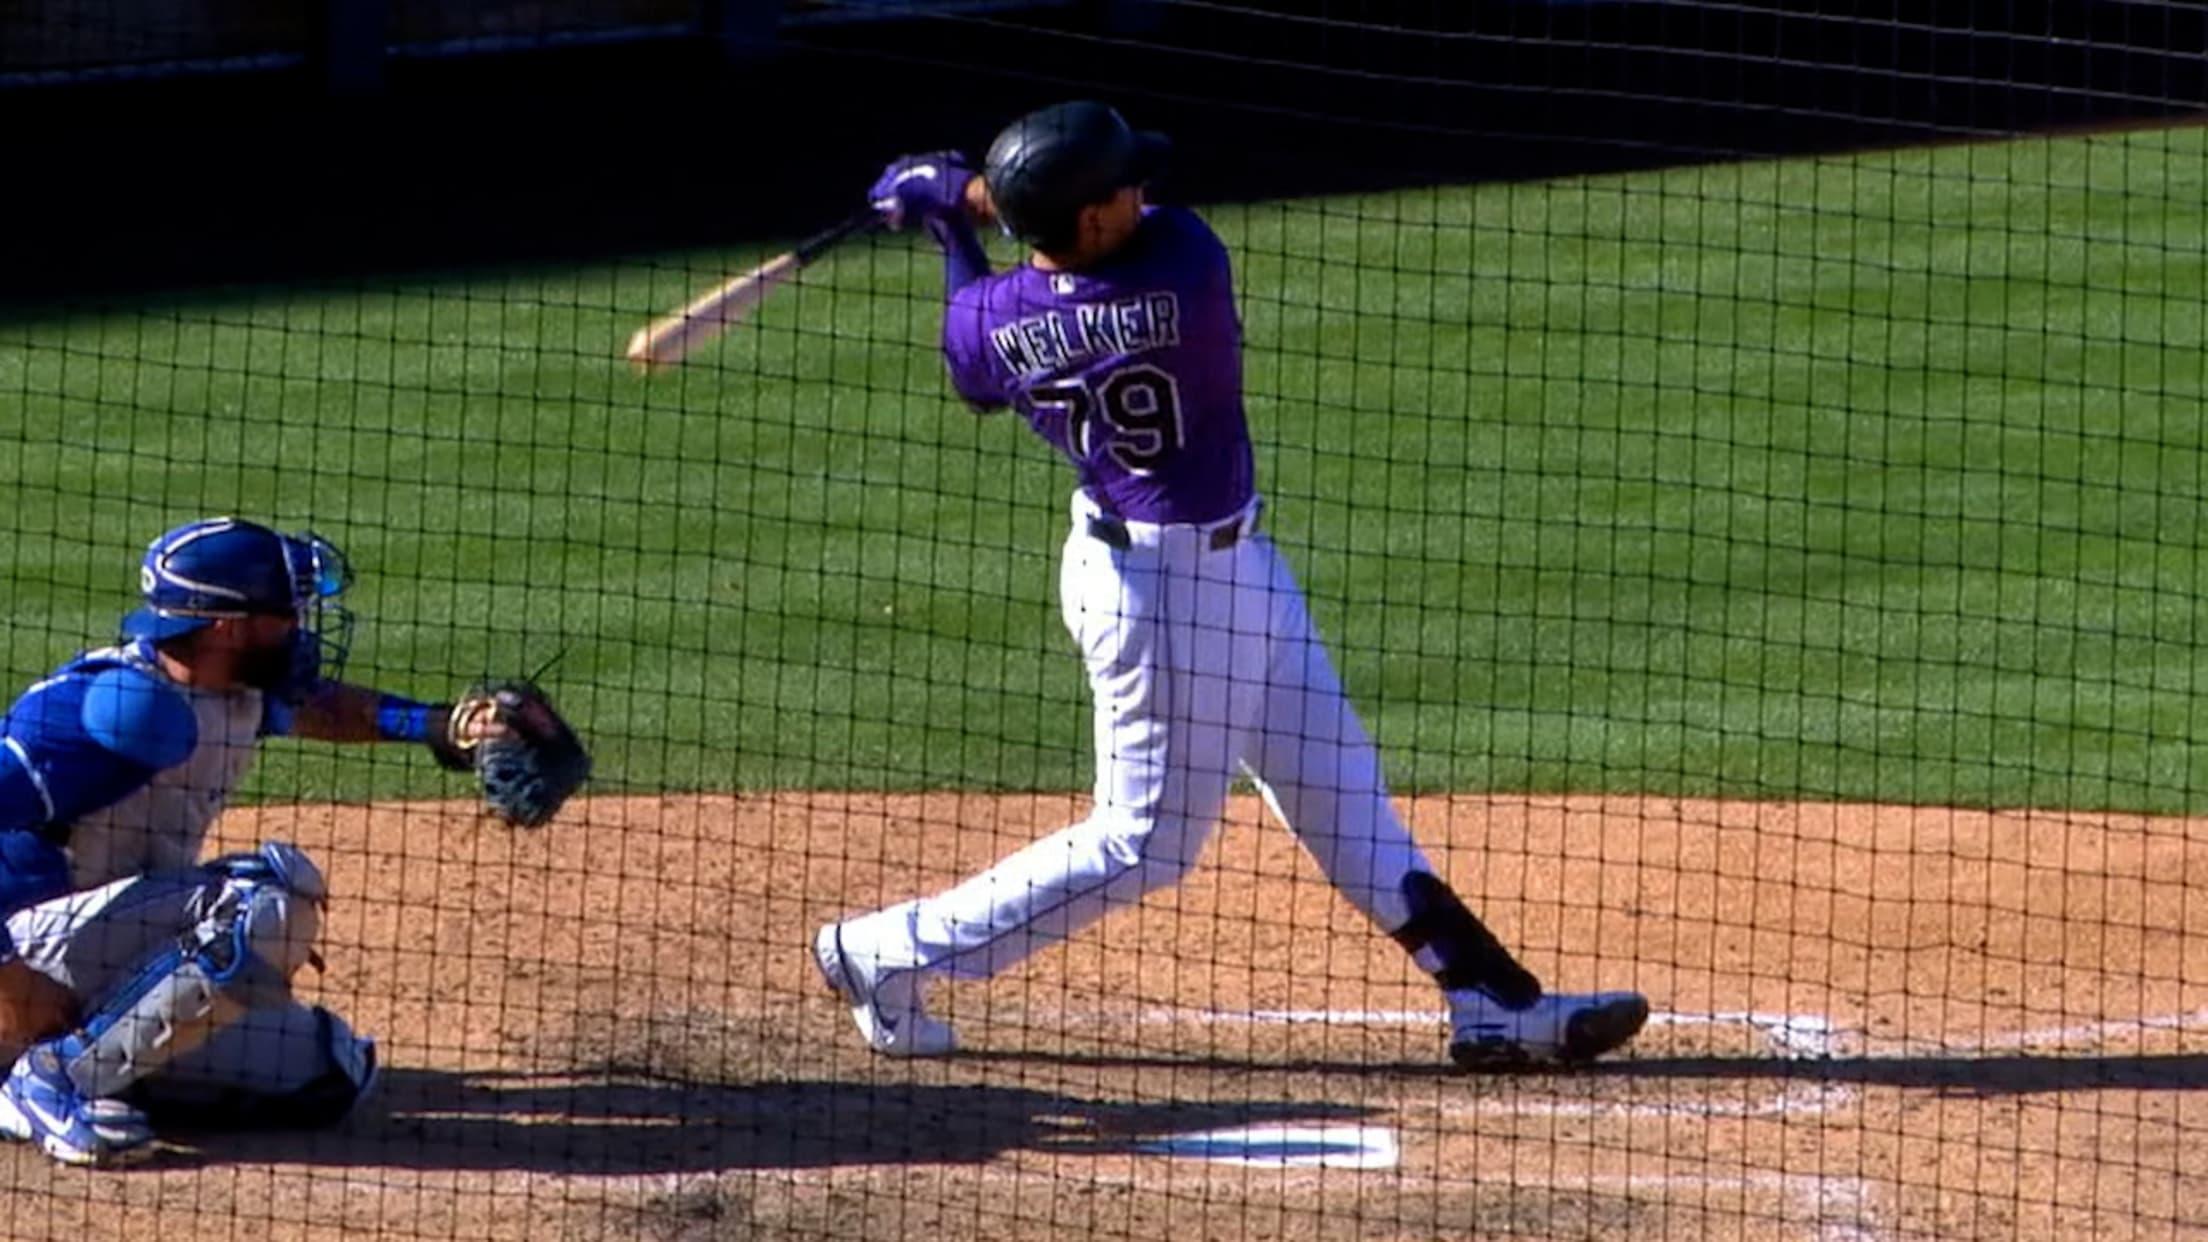 Colton Welker's solo home run